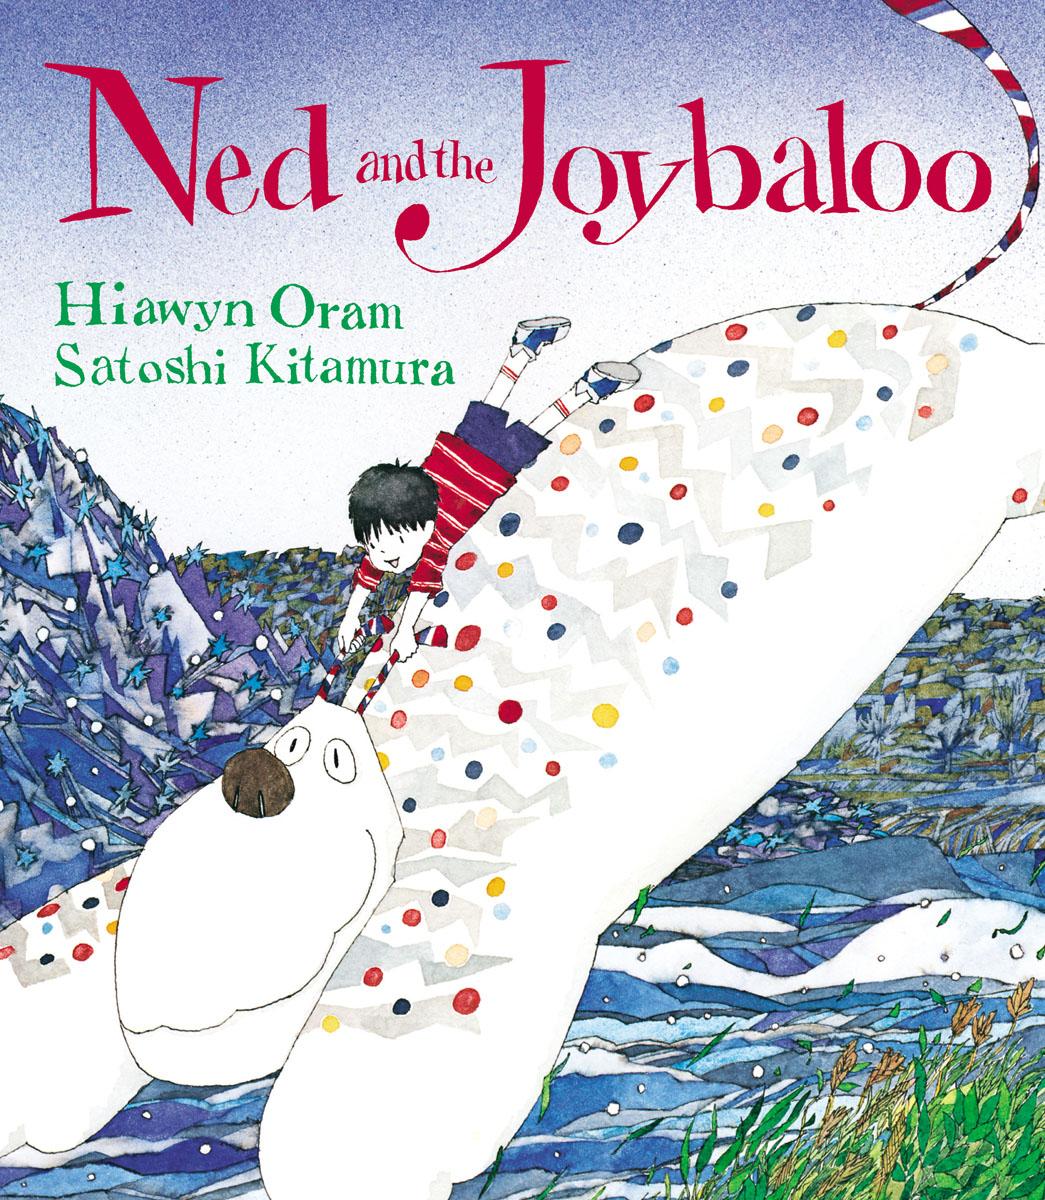 Ned And The Joybaloo the ned davis market companion